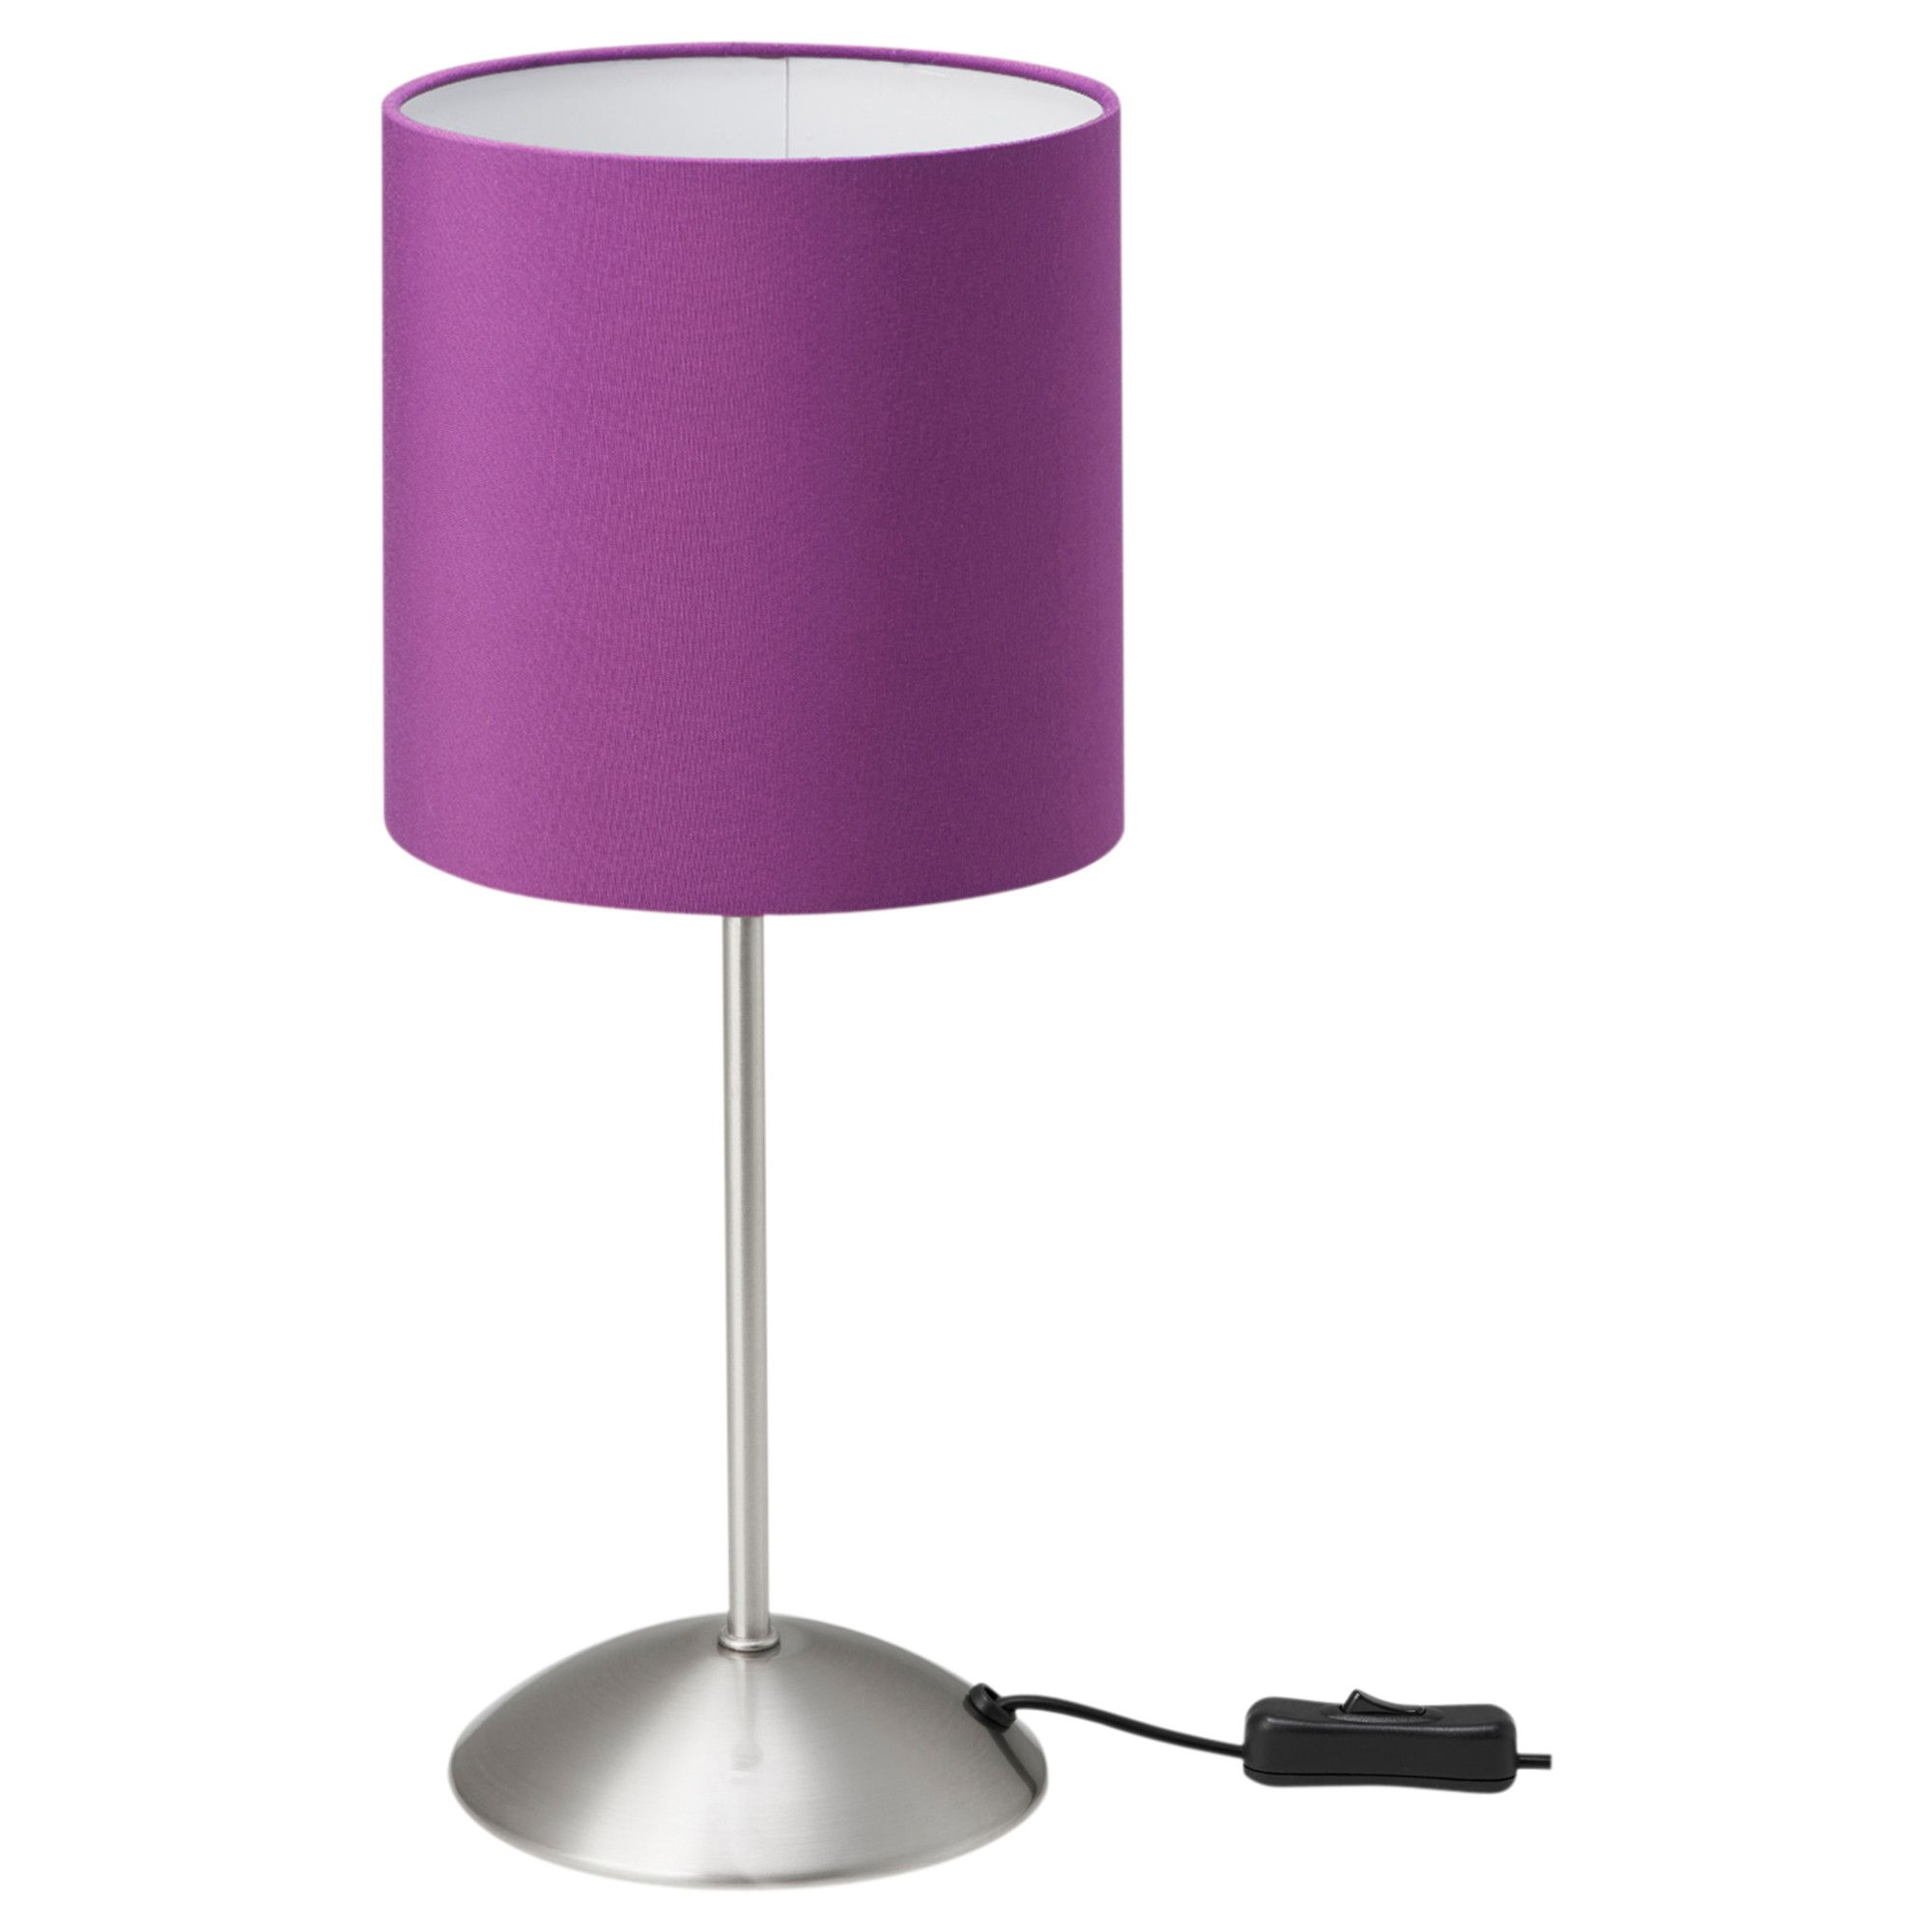 Tiarp table lamp light lilac lamp light lilacs and decorative lights tiarp table lamp light lilac ikea aloadofball Gallery